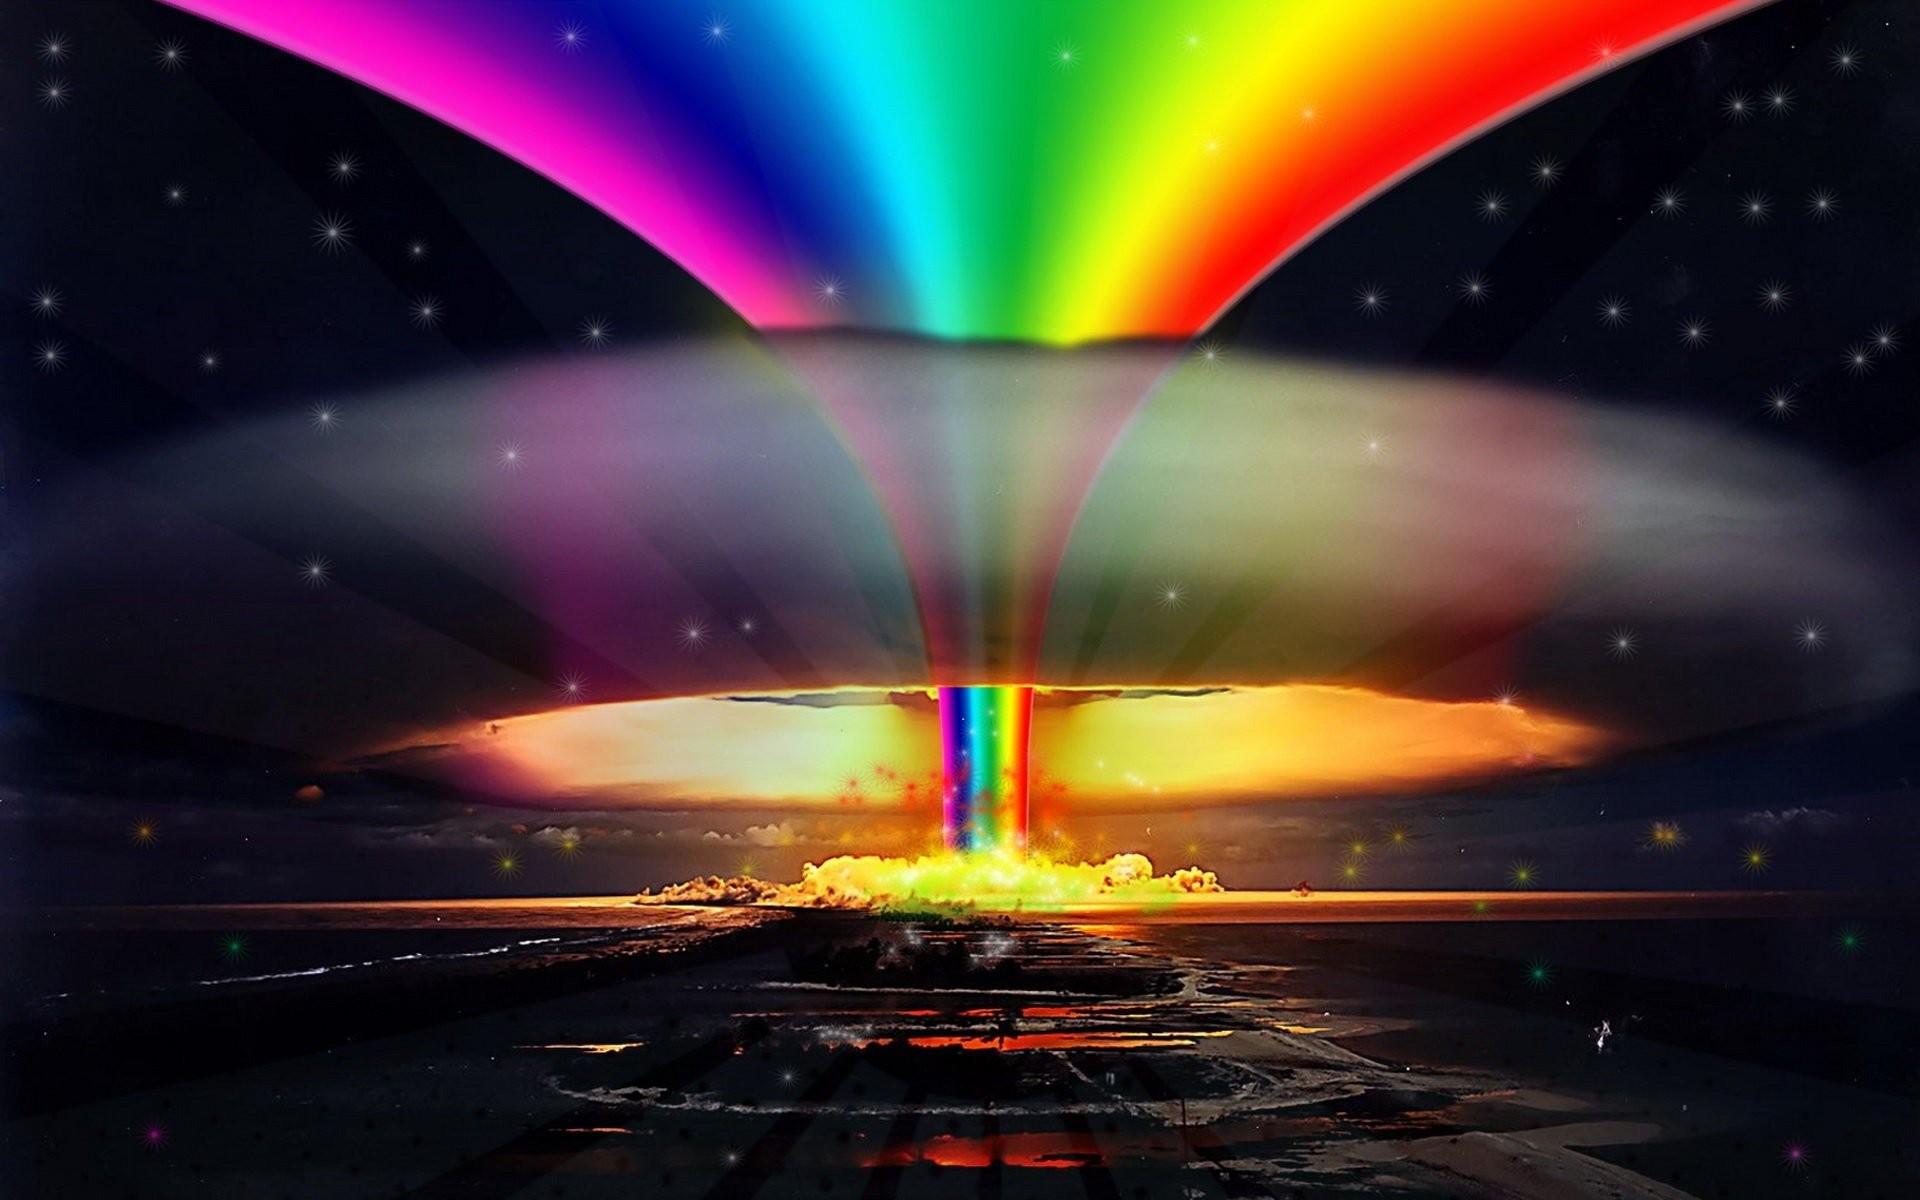 explosions pride rainbows selective coloring gay wallpaper background